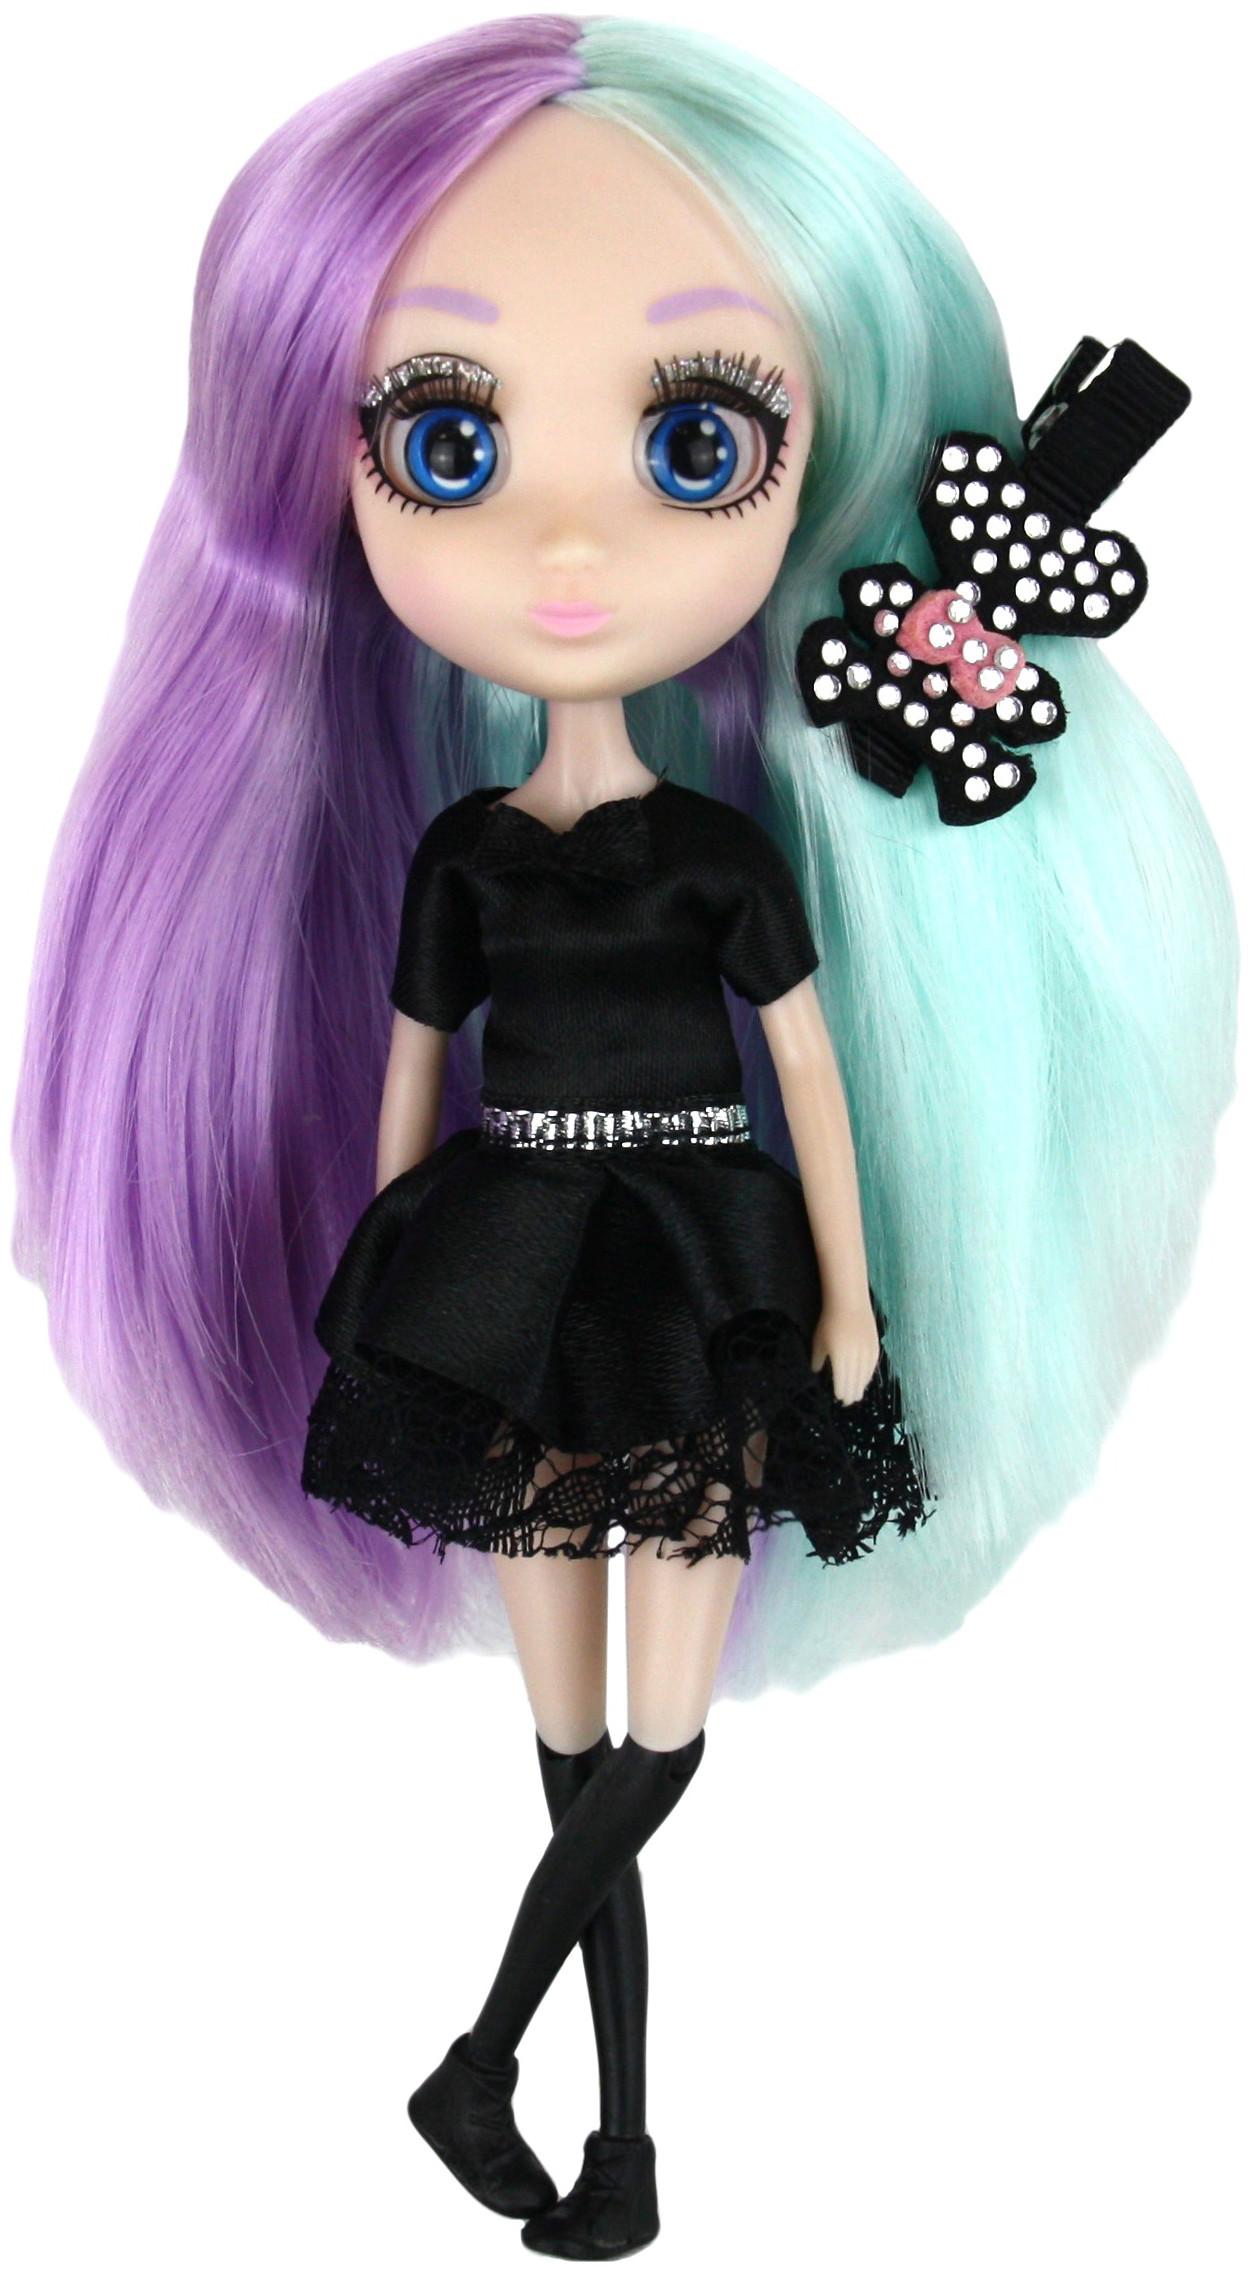 Кукла Shibajuku Girls Йоко 15 см кукла shibajuku girls йоко 15 см